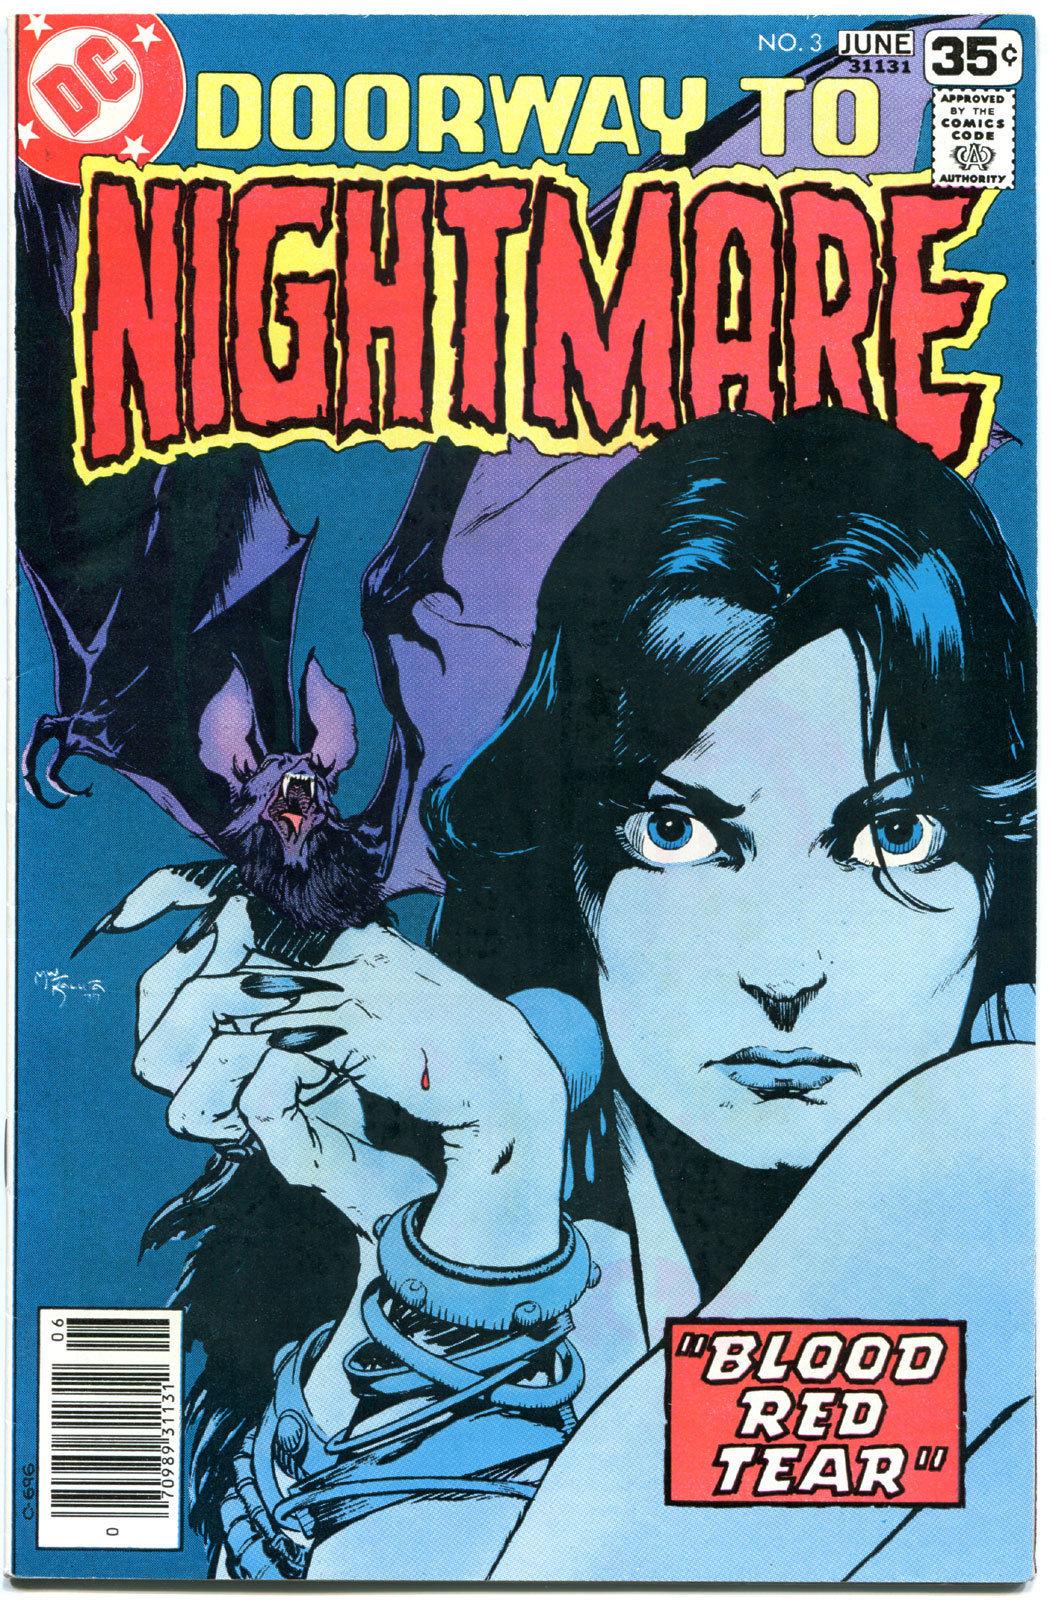 DOORWAY TO NIGHTMARE #3, VF, Michael Kaluta,Tarot, Occult, 1978, more in store